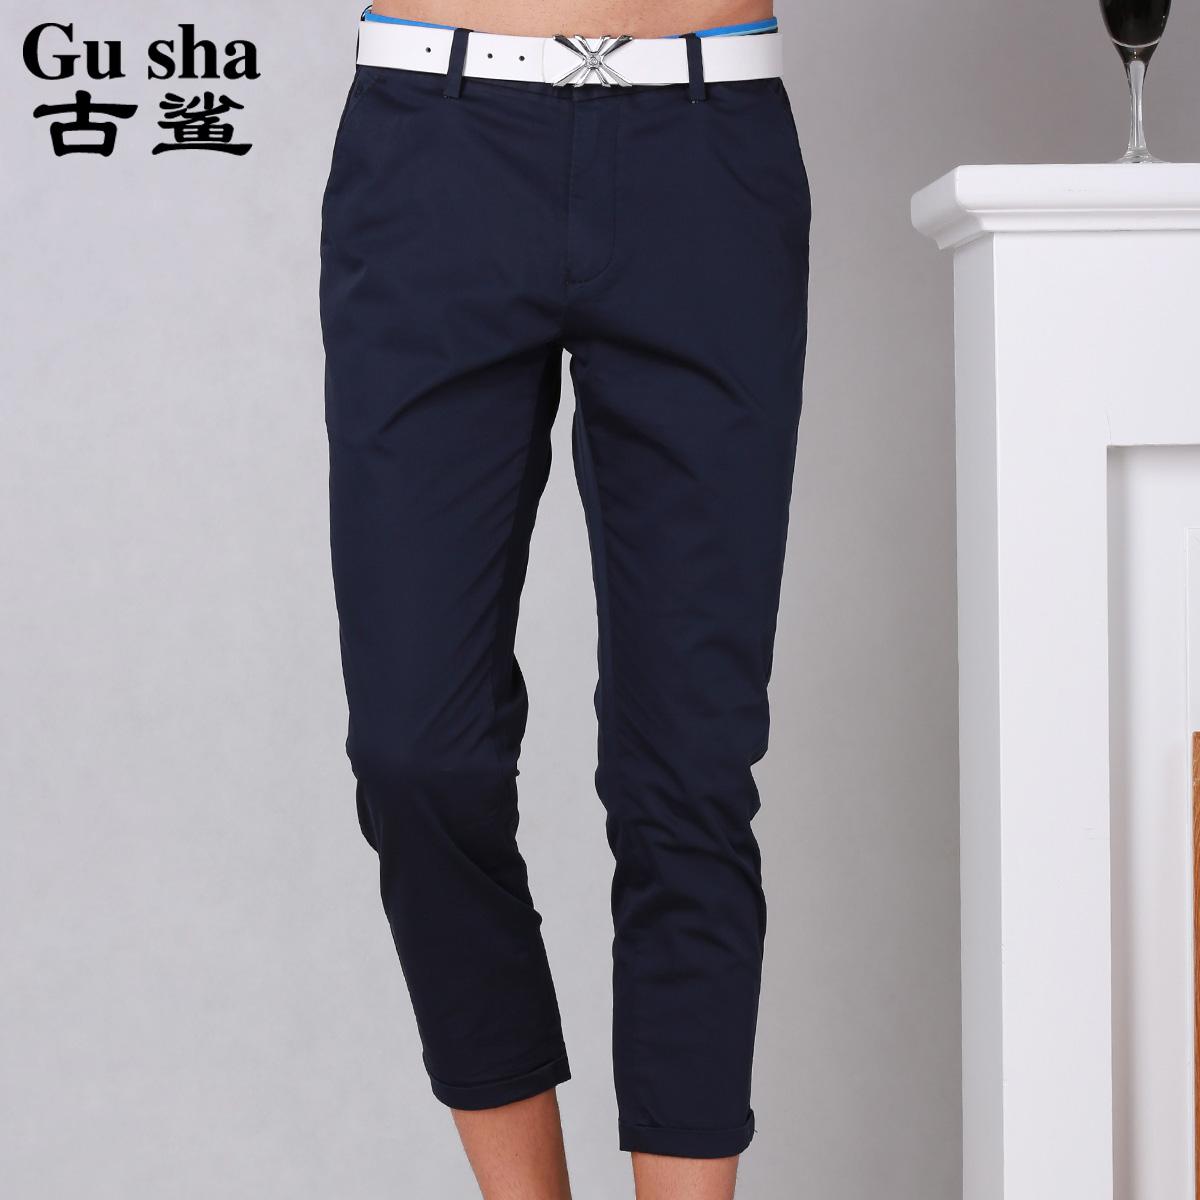 a1beceb103 Get Quotations · Ancient shark ancient shark men s pantyhose summer new  men s jeans slim korean fashion casual pants pants